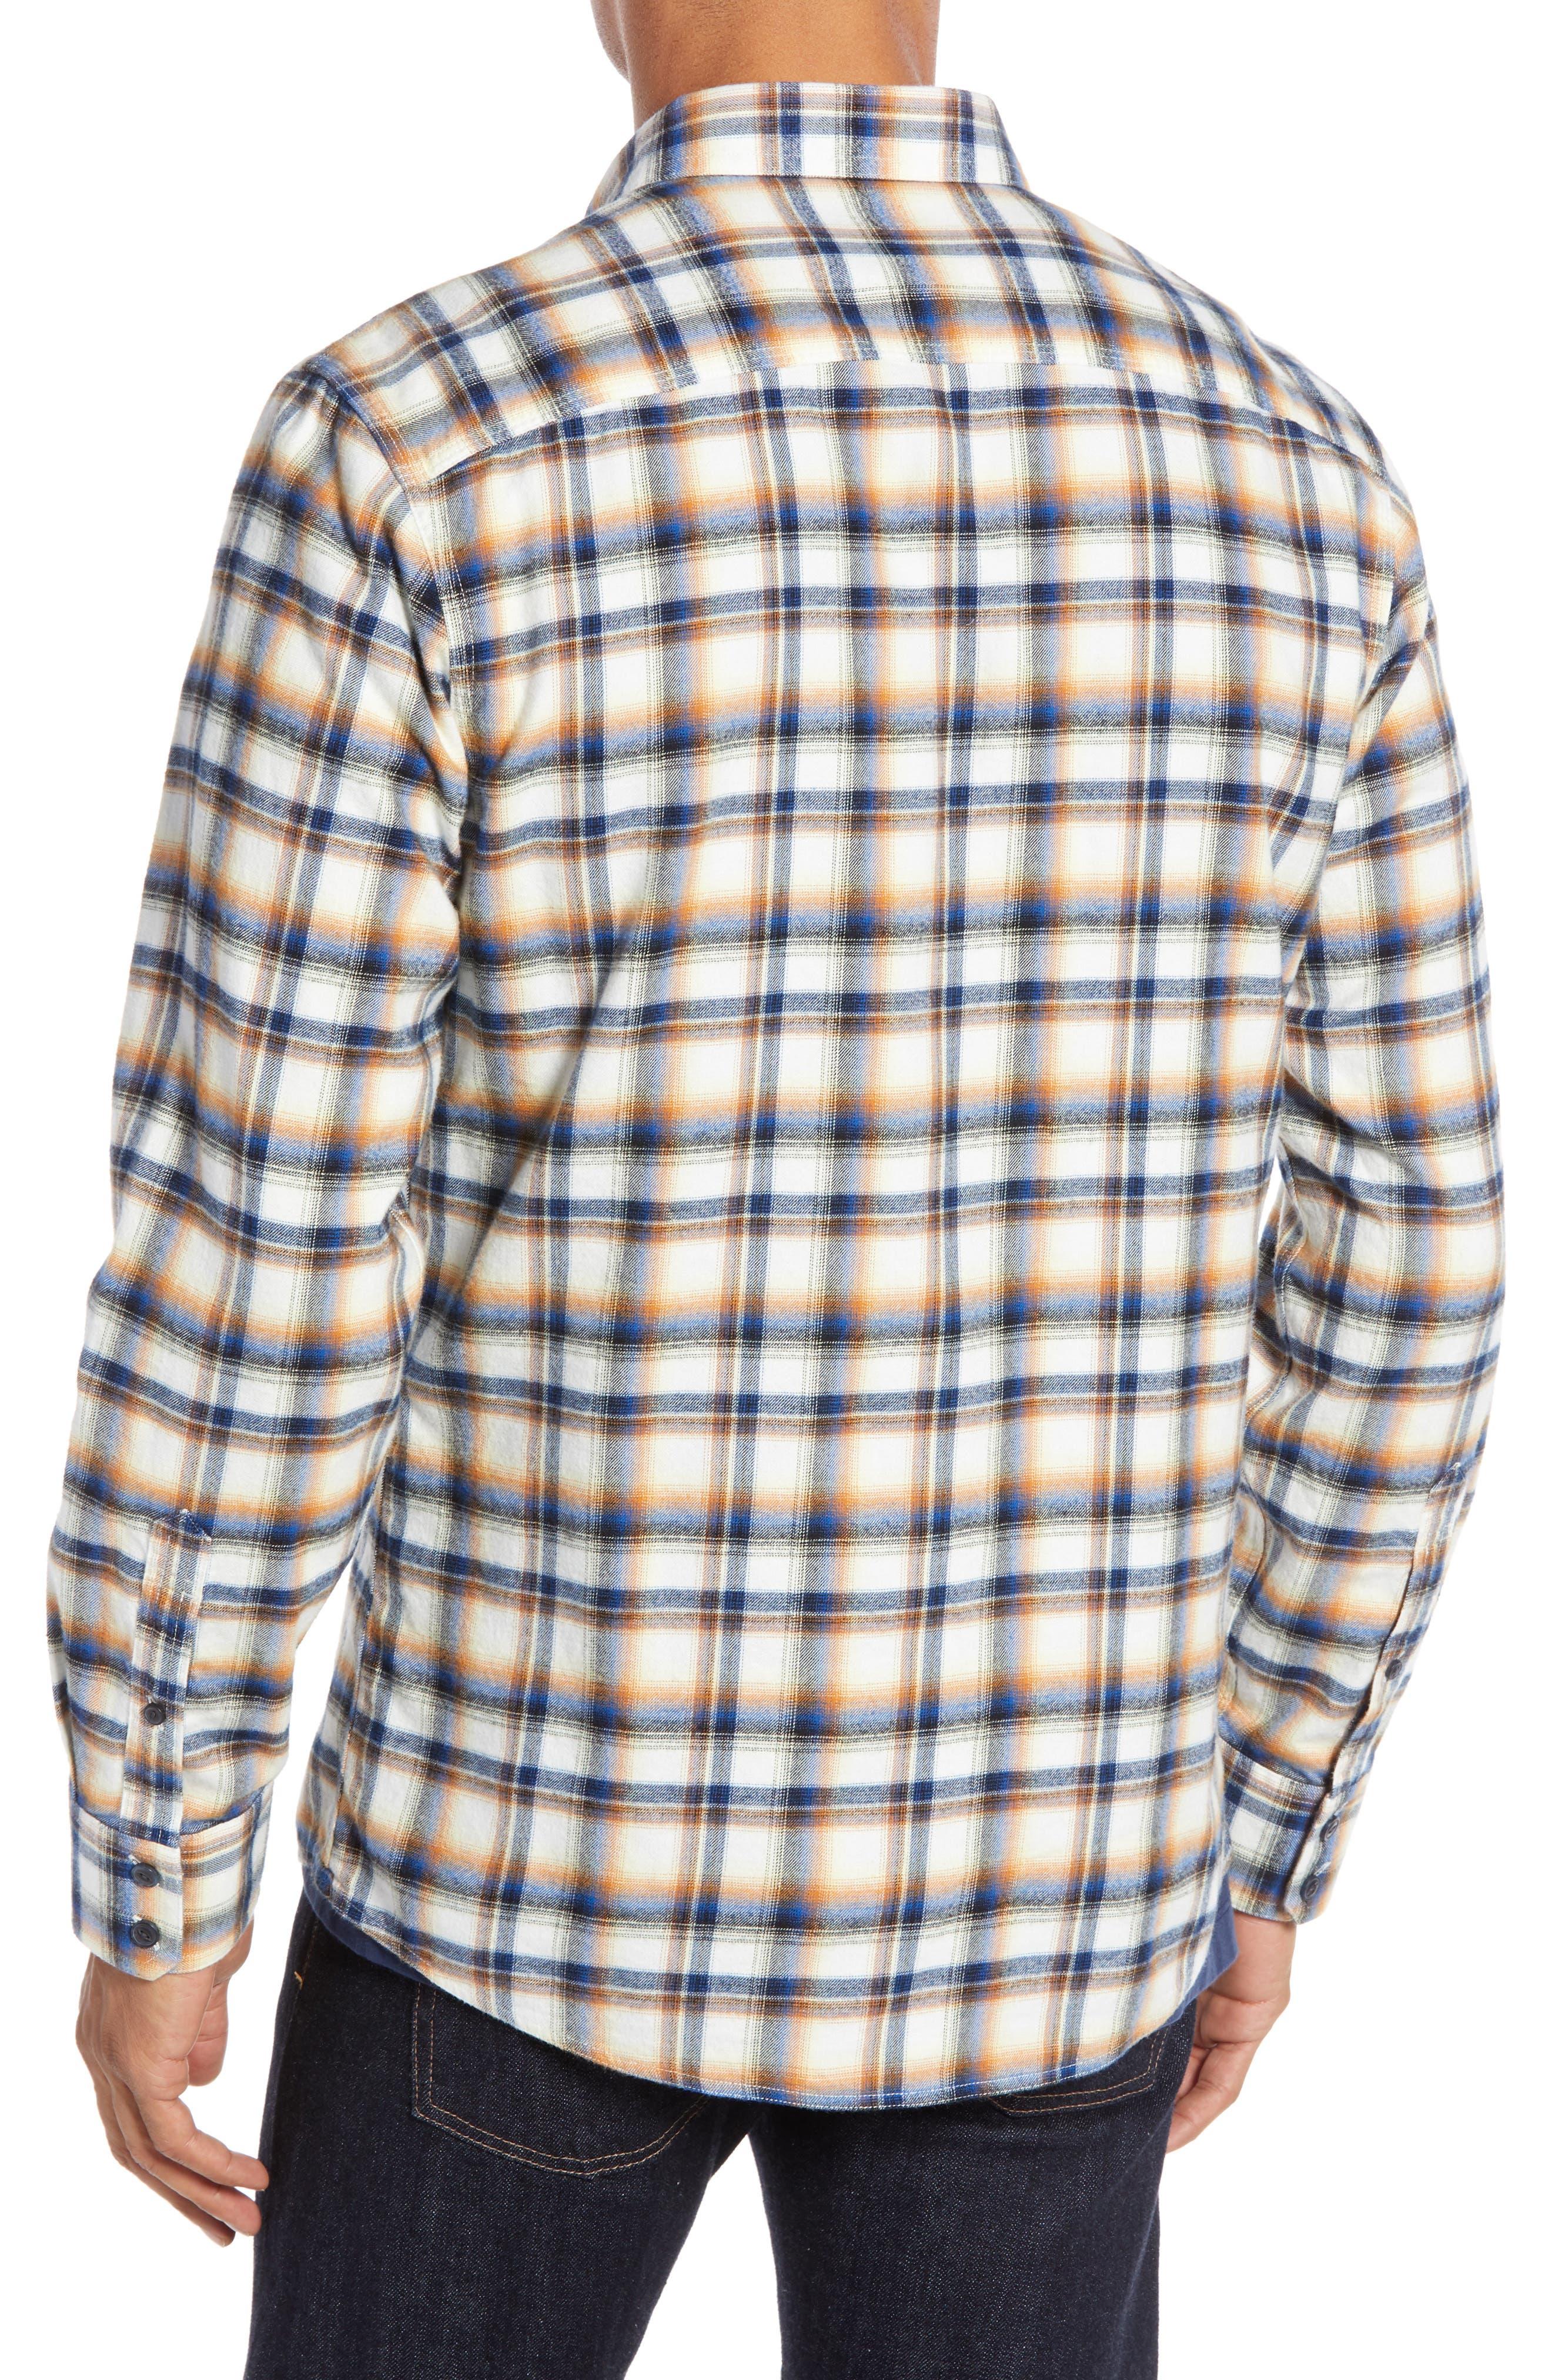 Trim Fit Trucker Plaid Sport Shirt,                             Alternate thumbnail 3, color,                             IVORY BLUE ORANGE PLAID